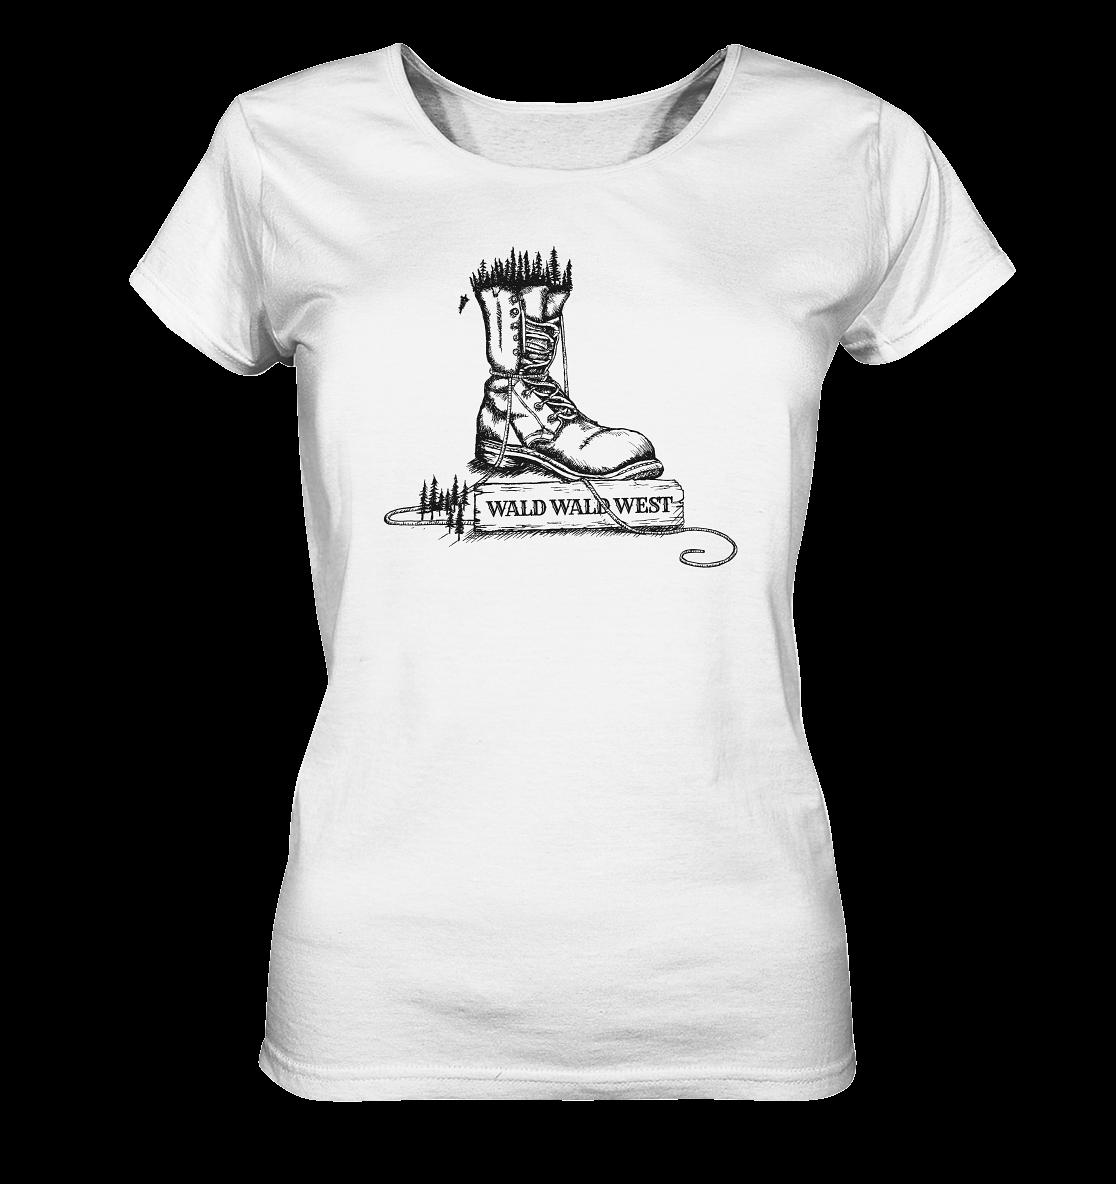 front-ladies-organic-shirt-f8f8f8-1116x.png